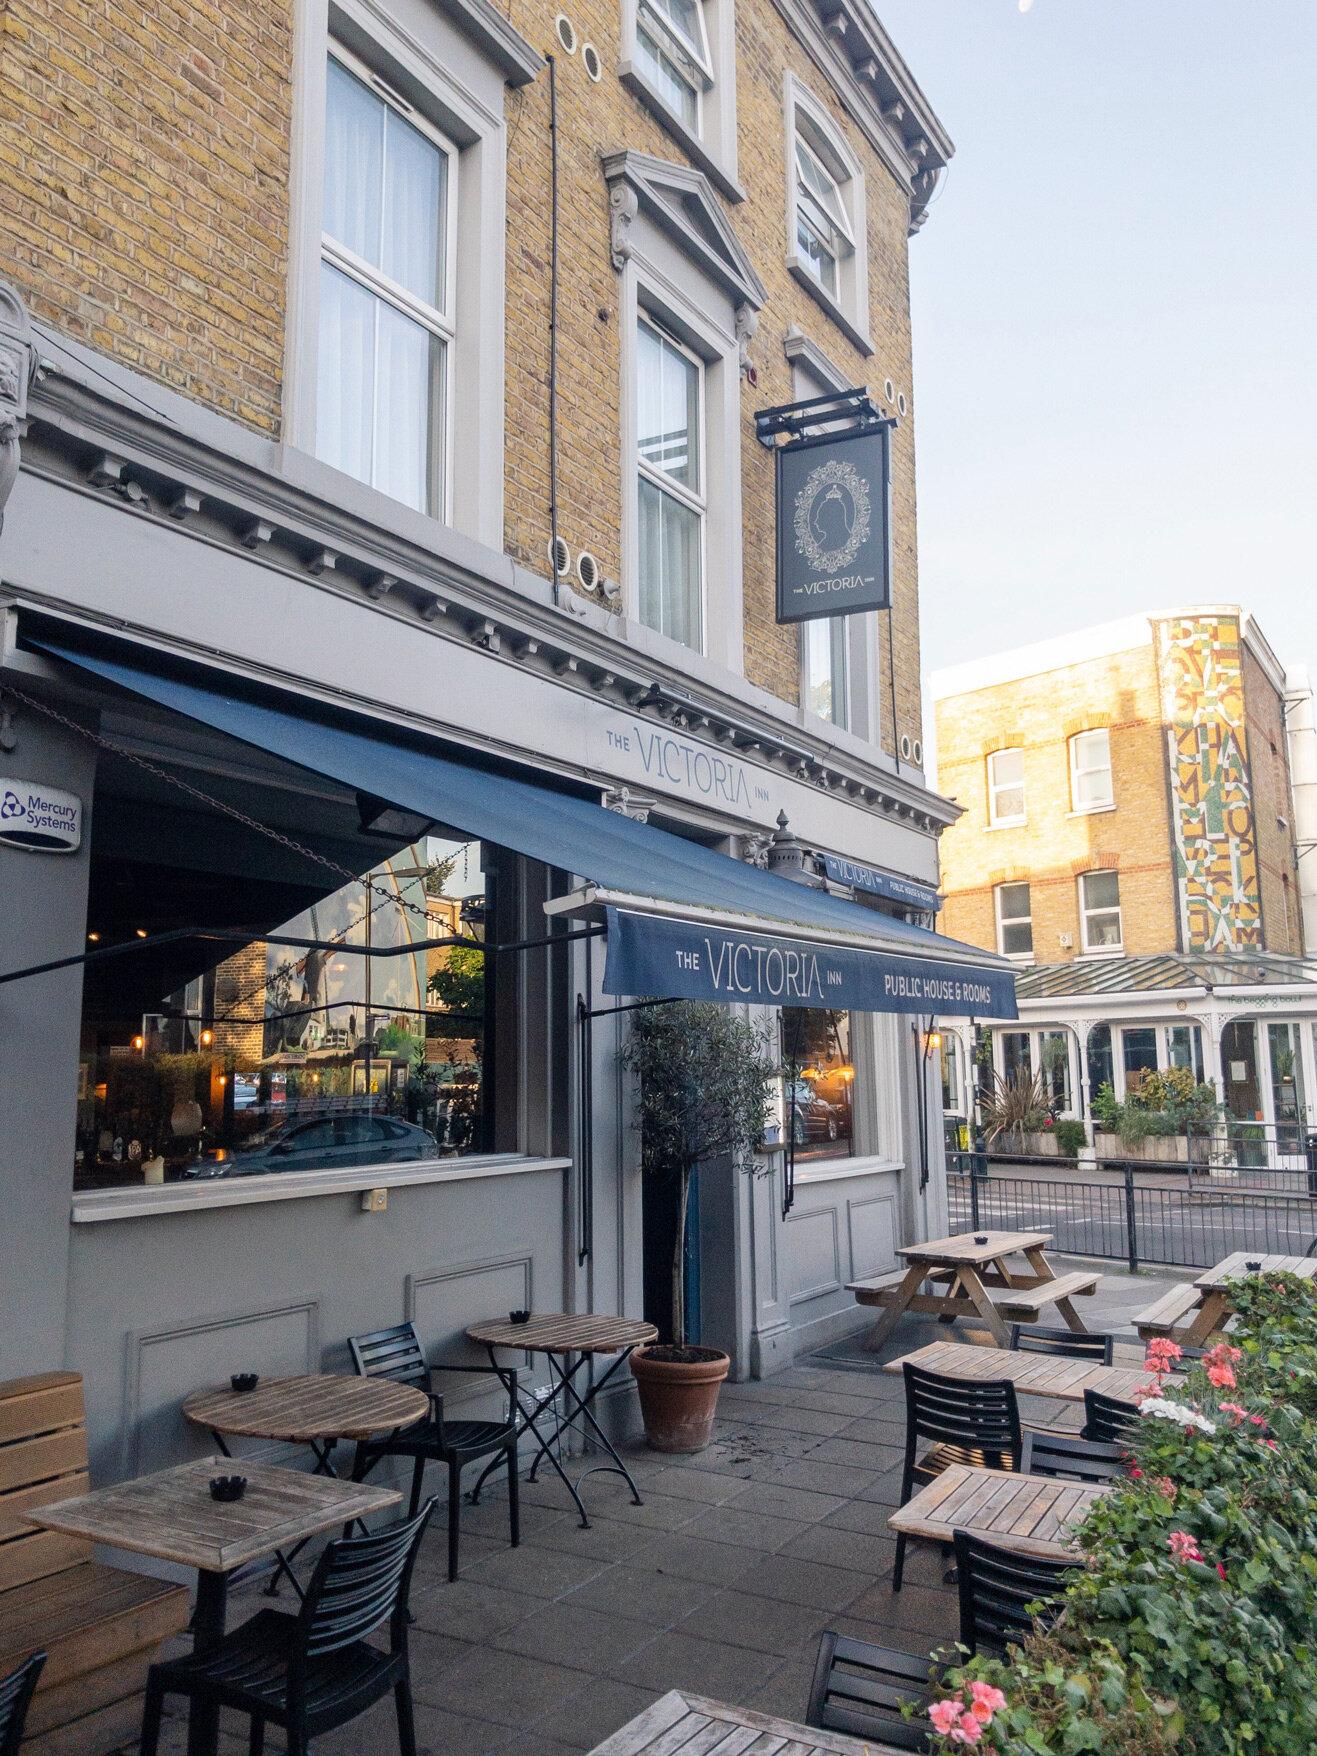 The-Victoria-Inn-Peckham.jpg